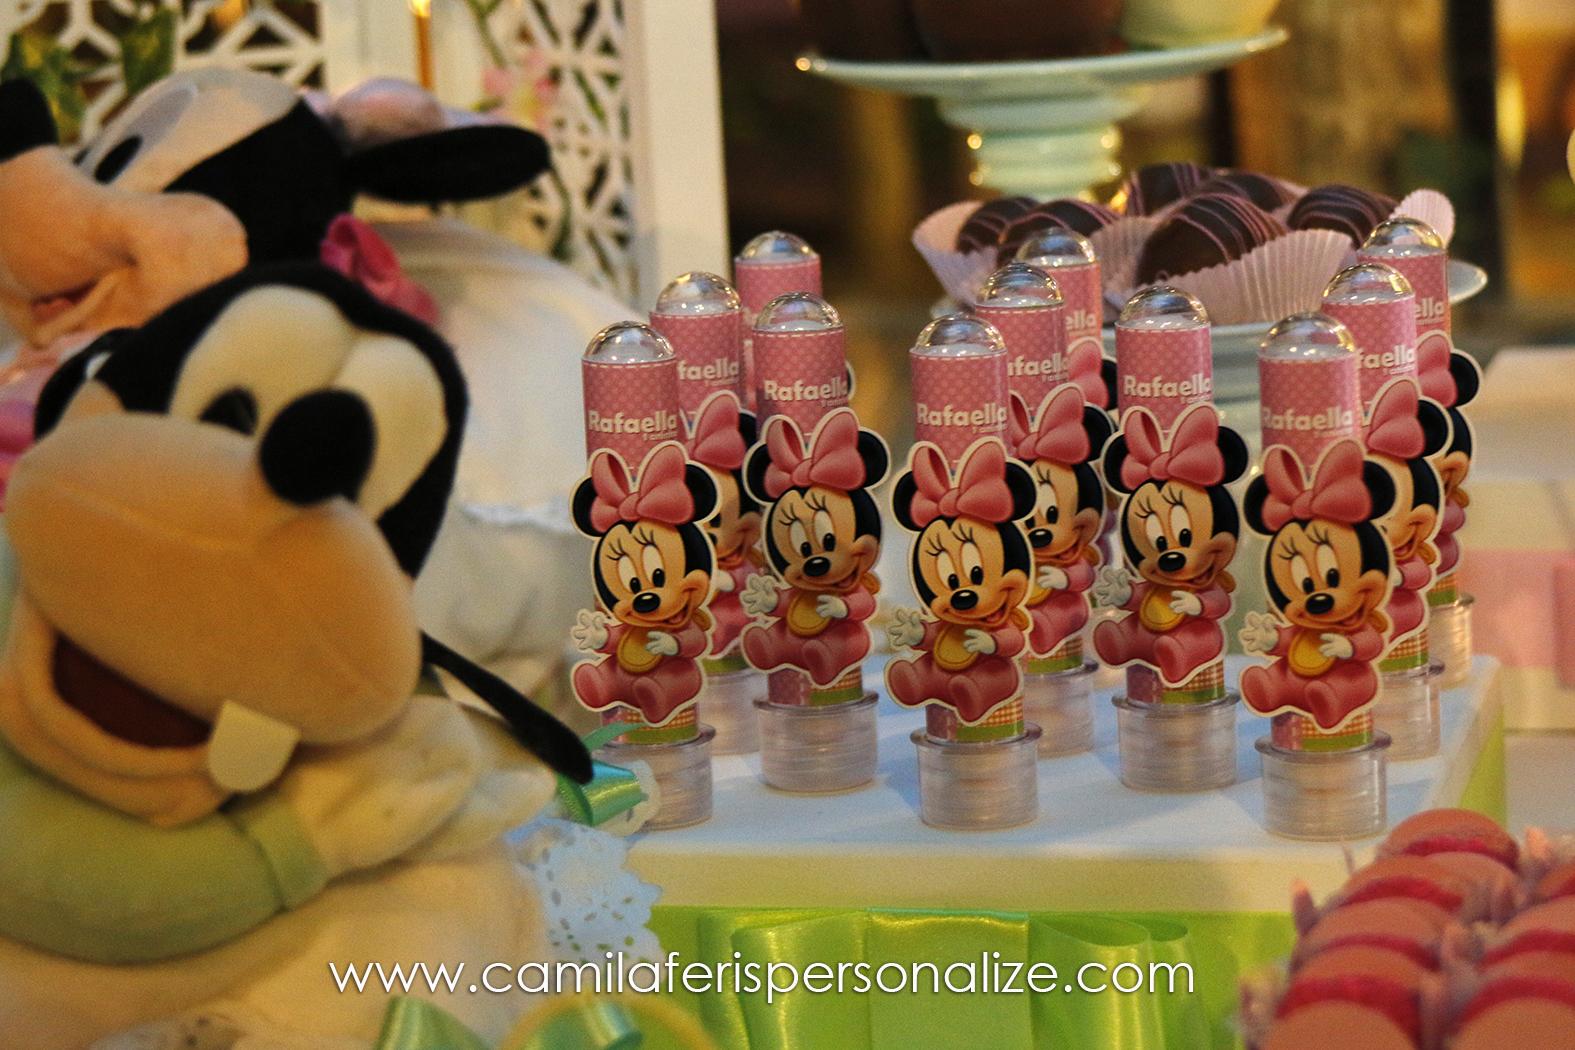 tubetes personalizados baby disney.jpg